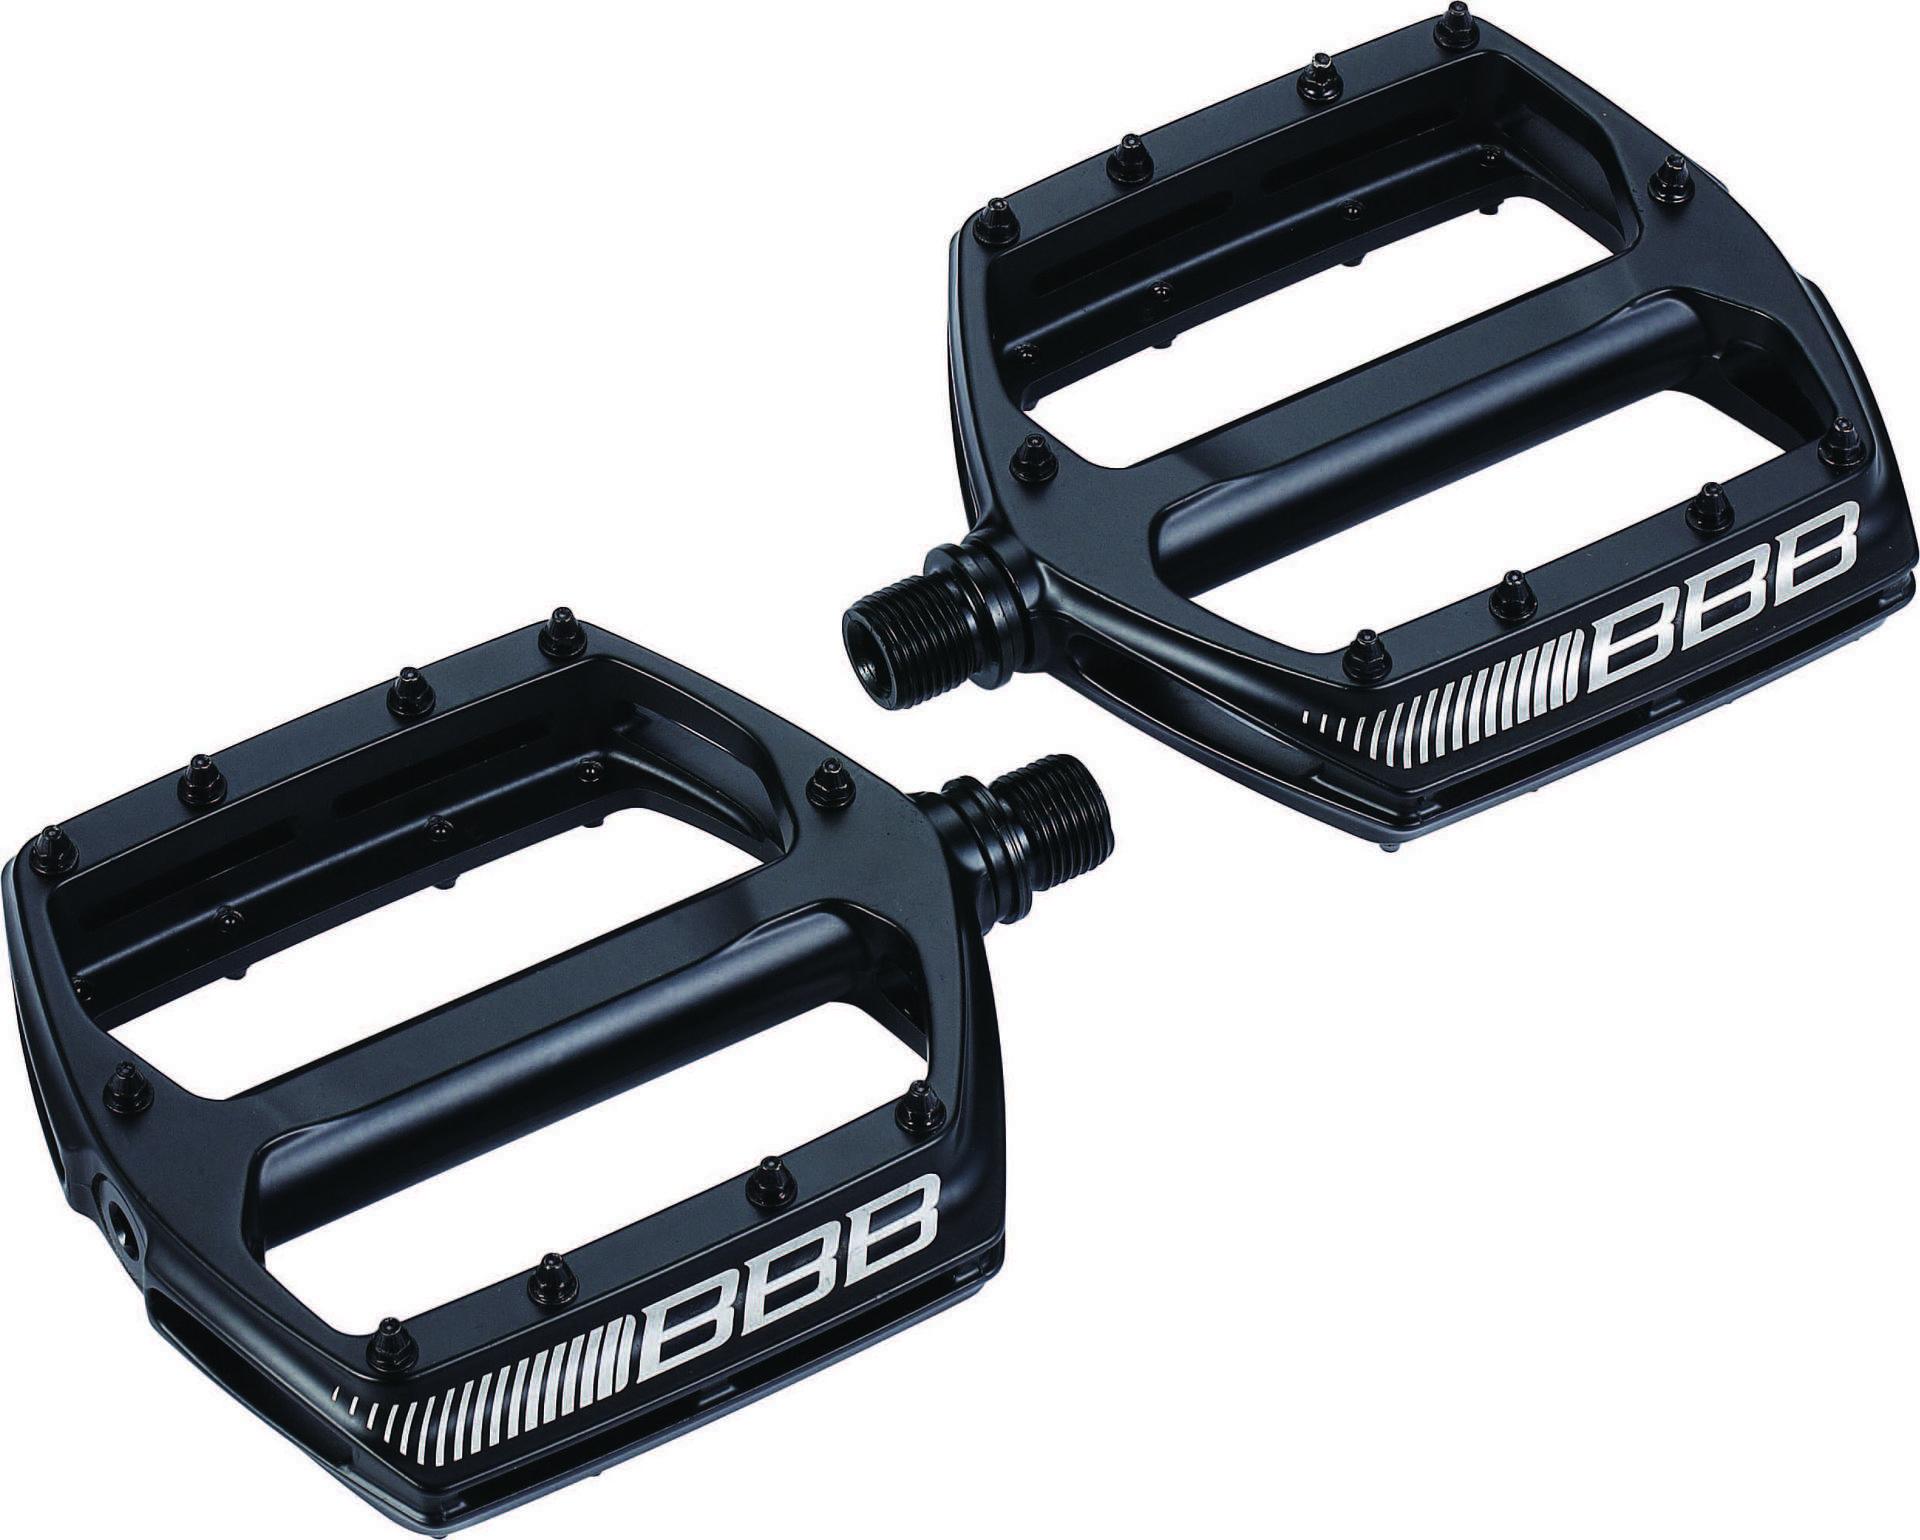 Запчасть BBB BPD-36 CoolRide mtb запчасть bbb bhg 19 lightfix 130mm